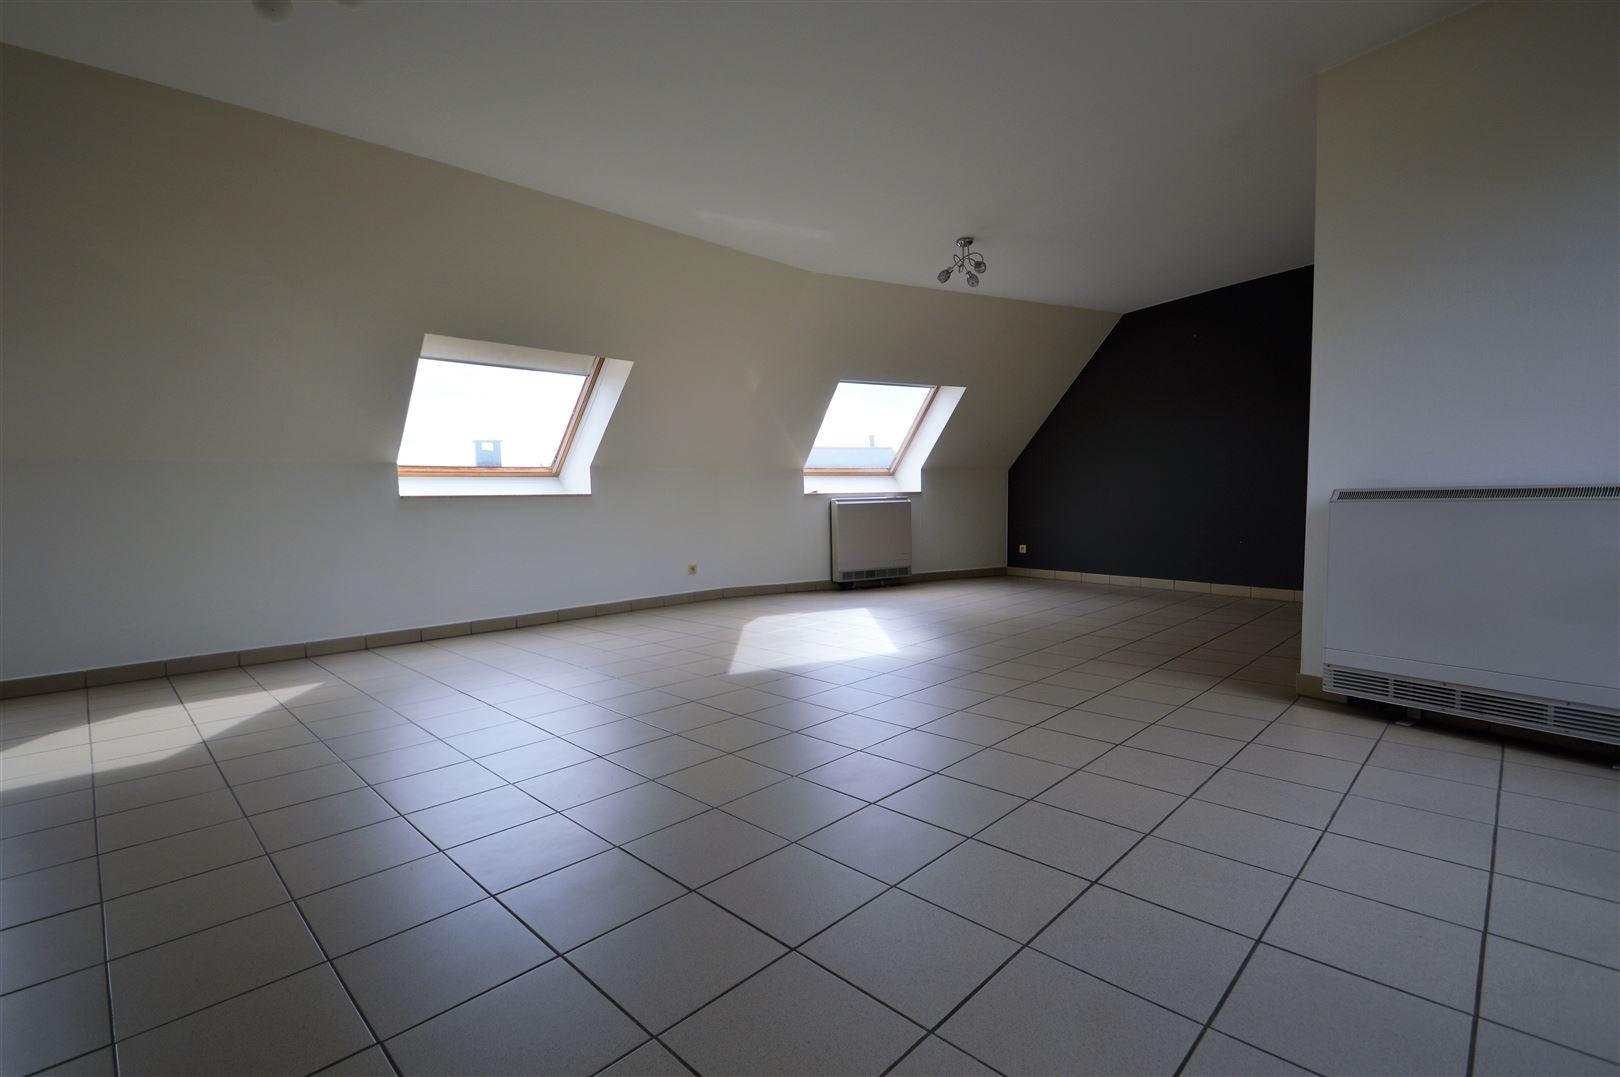 Foto 3 : Appartement te 9280 LEBBEKE (België) - Prijs € 645